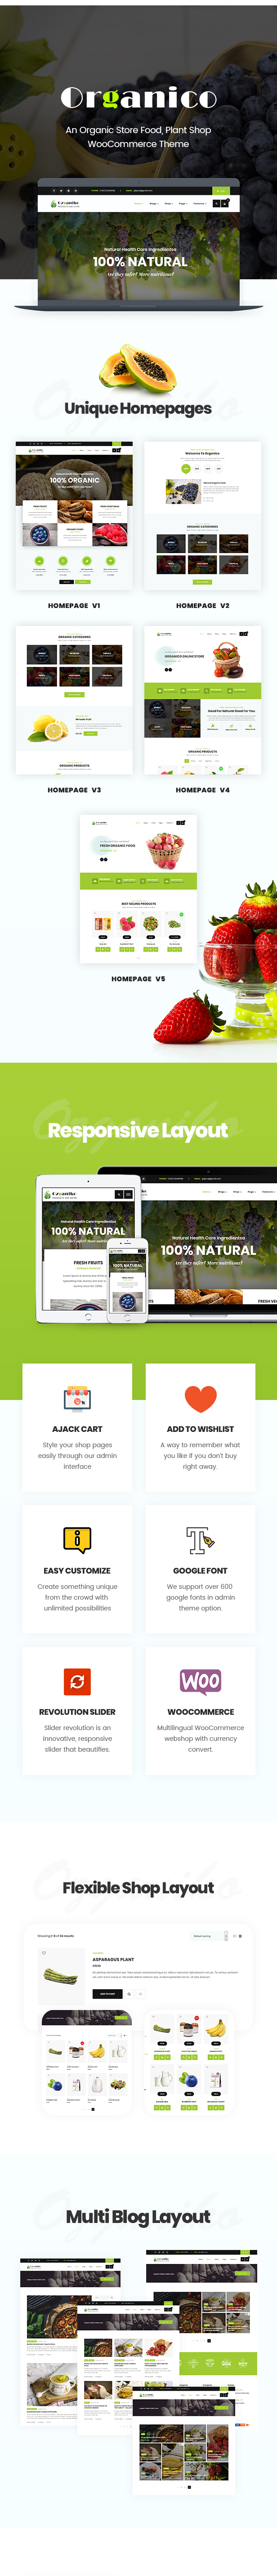 Ozganiko - A Organic Store And Food Shop WordPress Theme - 3